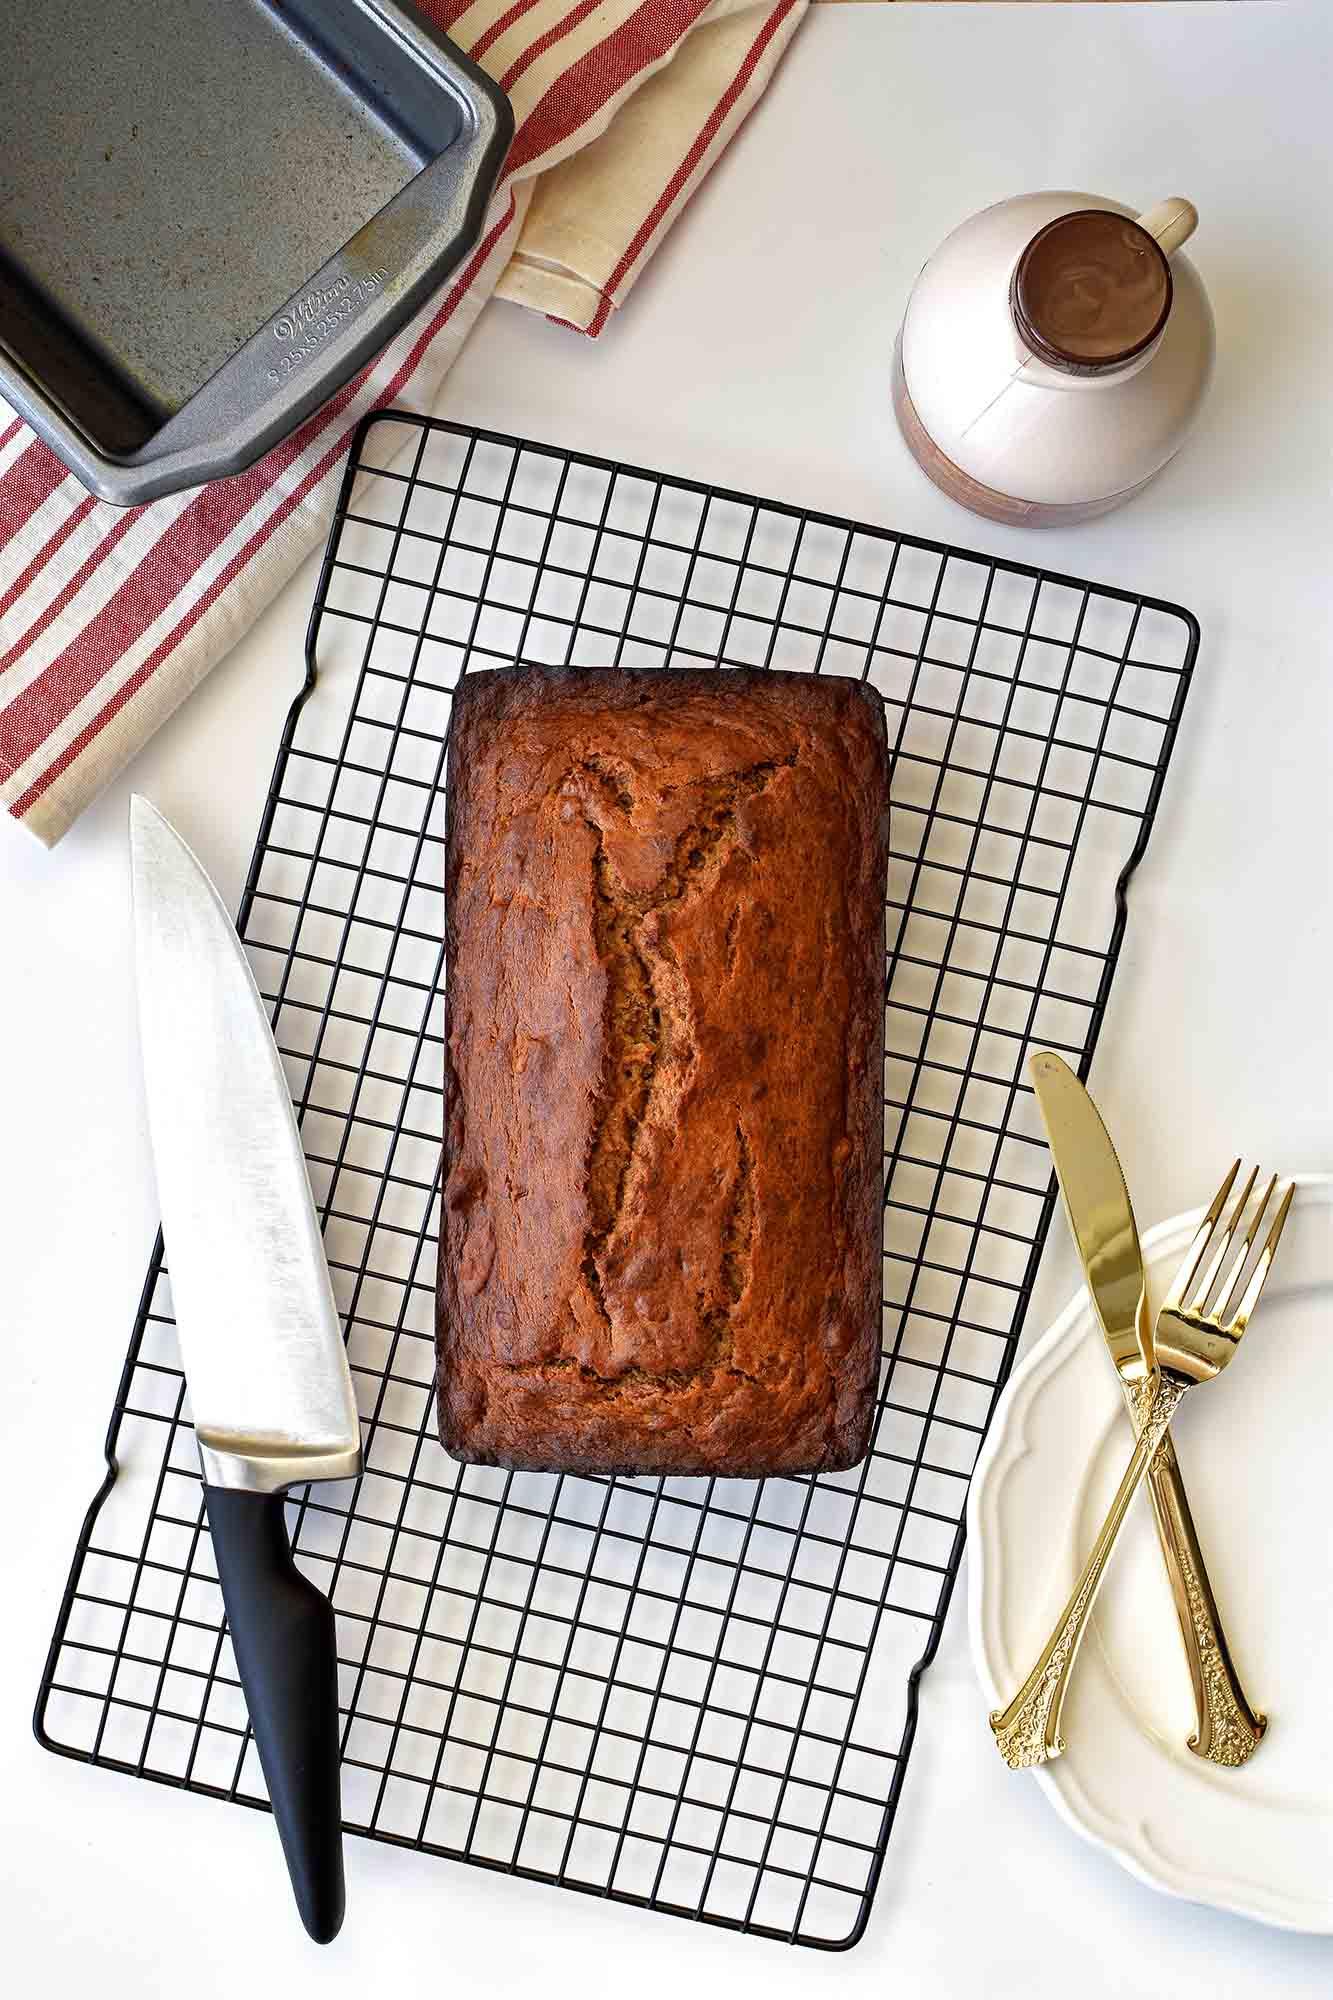 Whole Wheat Banana Bread - Pepper Delight #pepperdelightblog #recipe #bread #cake #bananabread #wholewheat #healthy #breakfast #honeycake